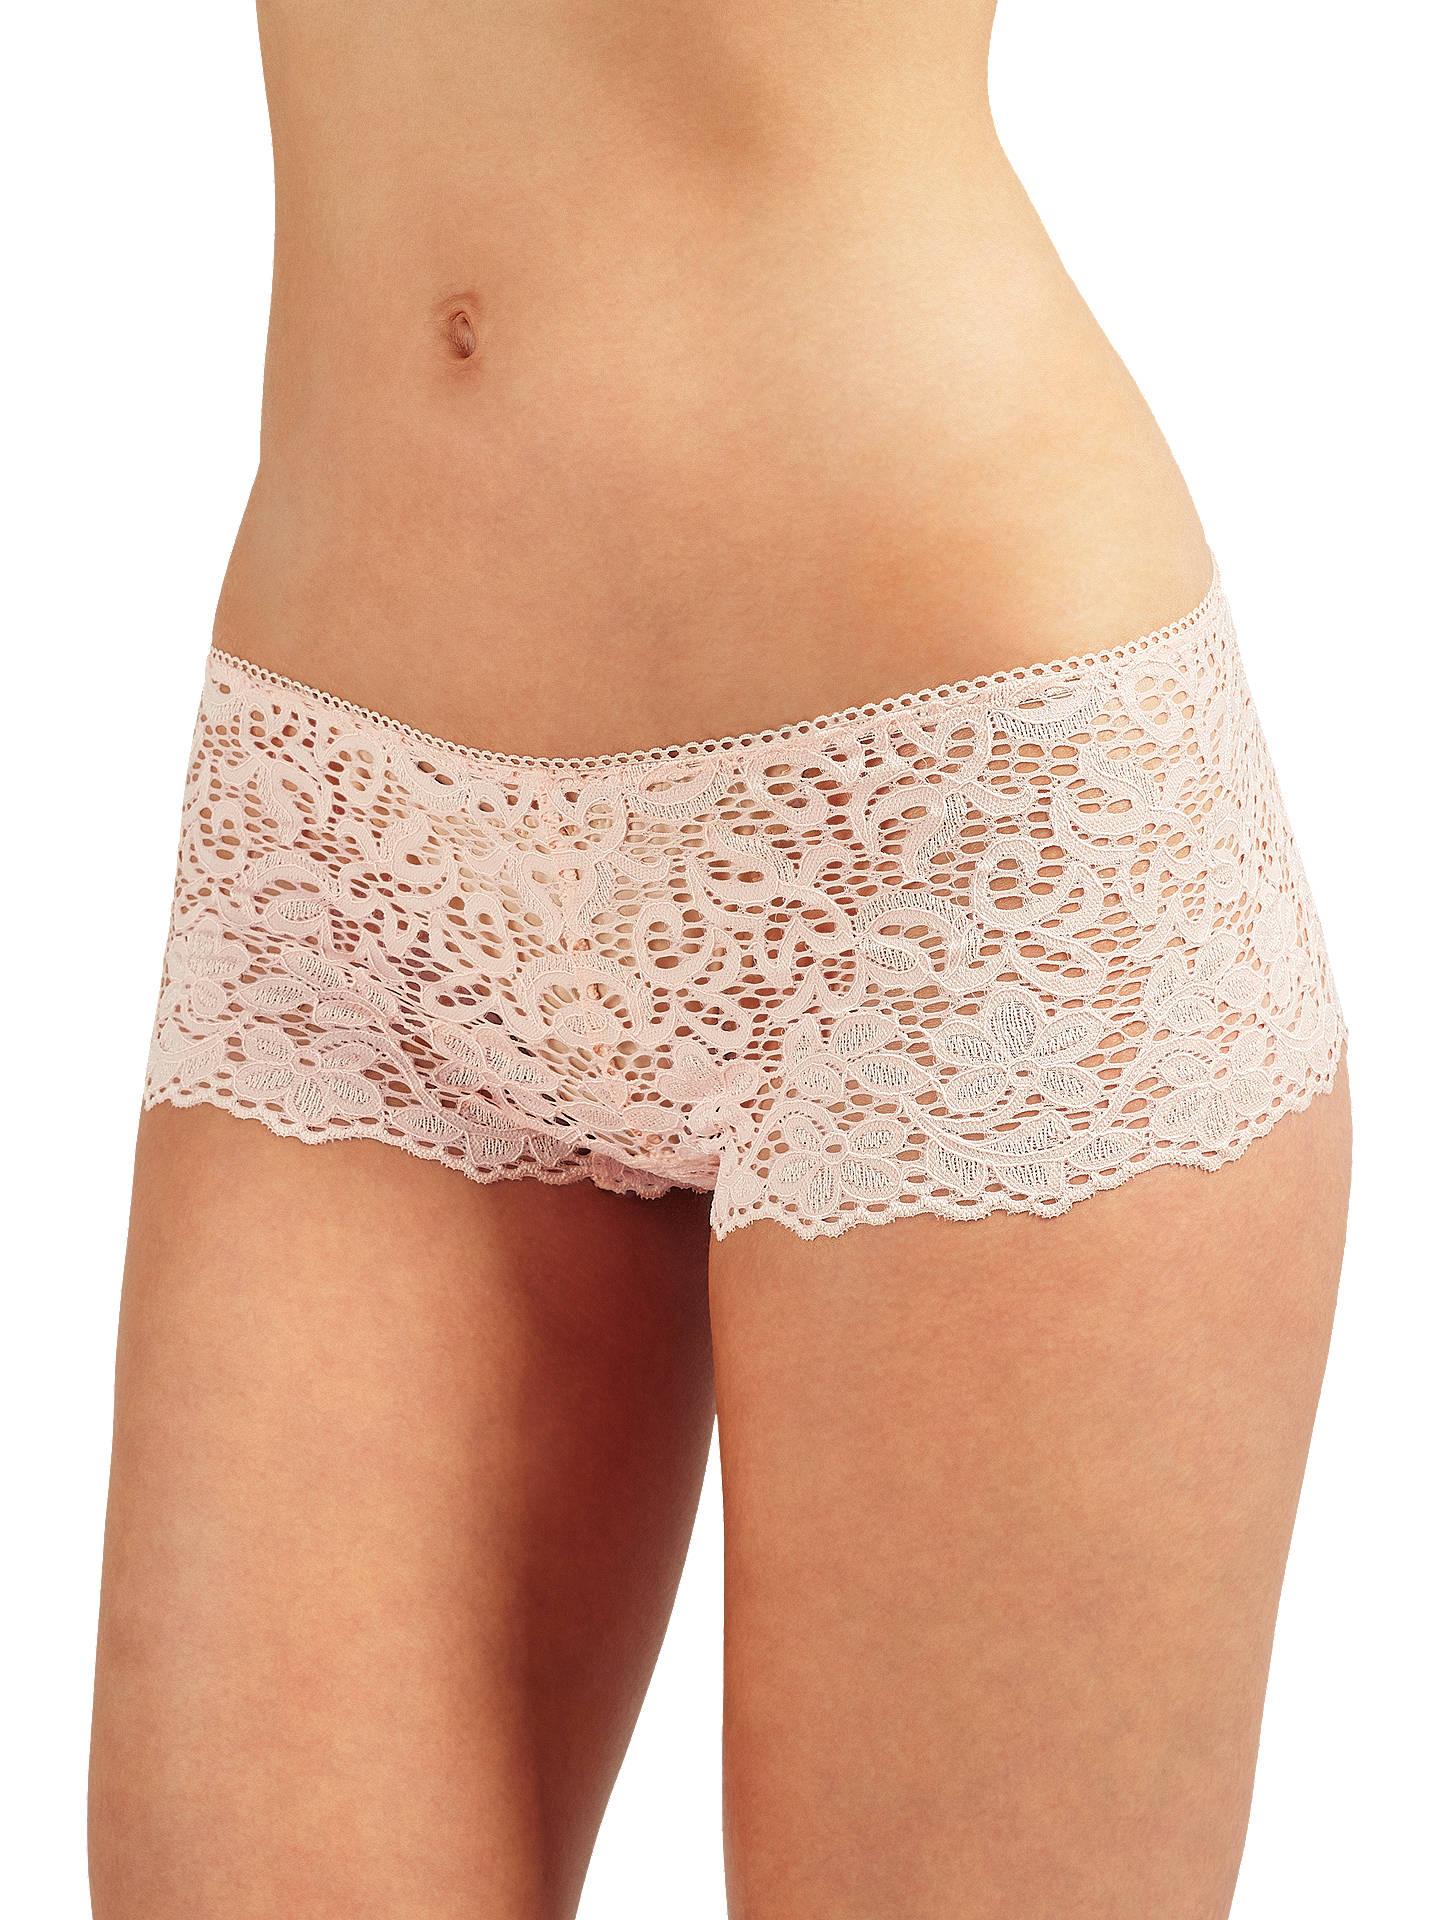 b25838fb37d Buy DKNY Classic Lace Boy Shorts, Blush, S Online at johnlewis.com ...